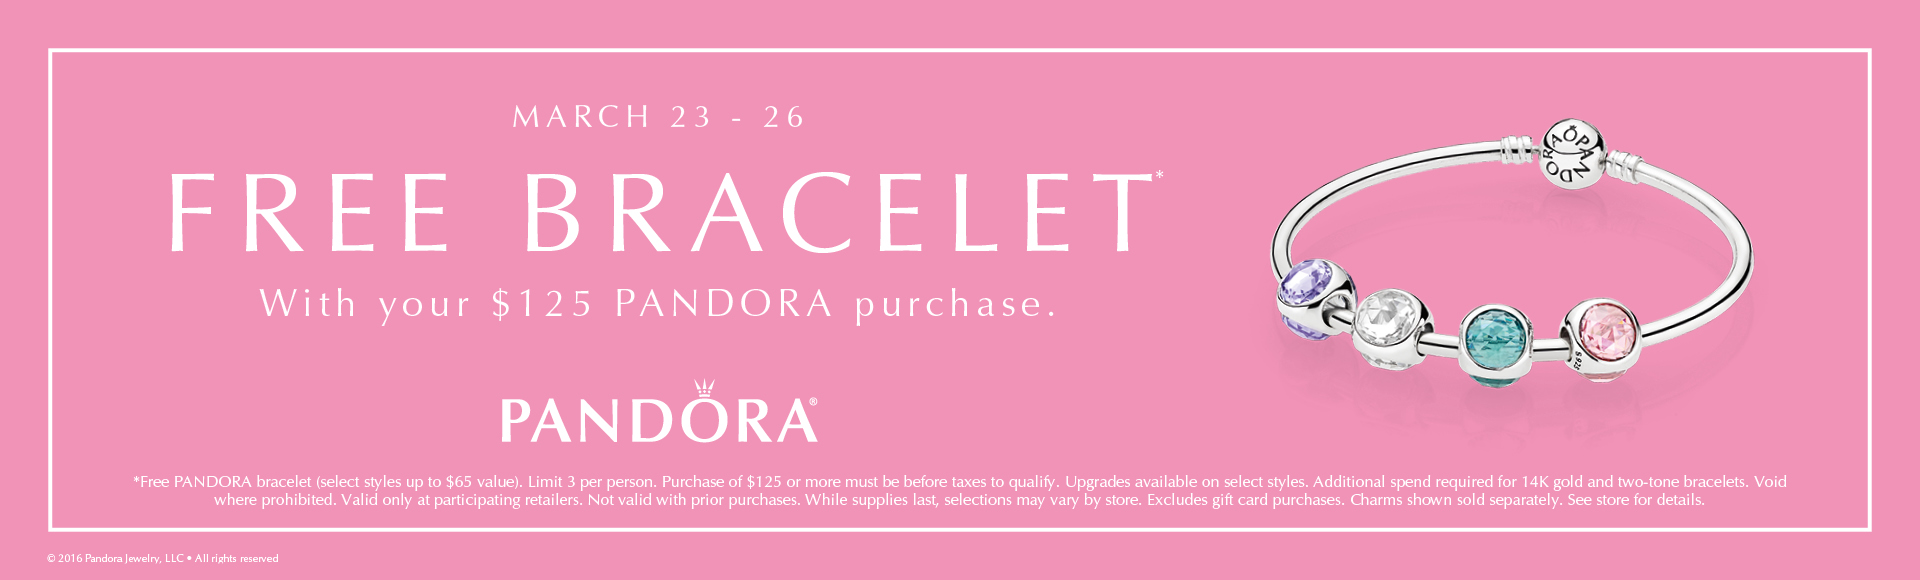 March Pandora Free Bracelet Event!